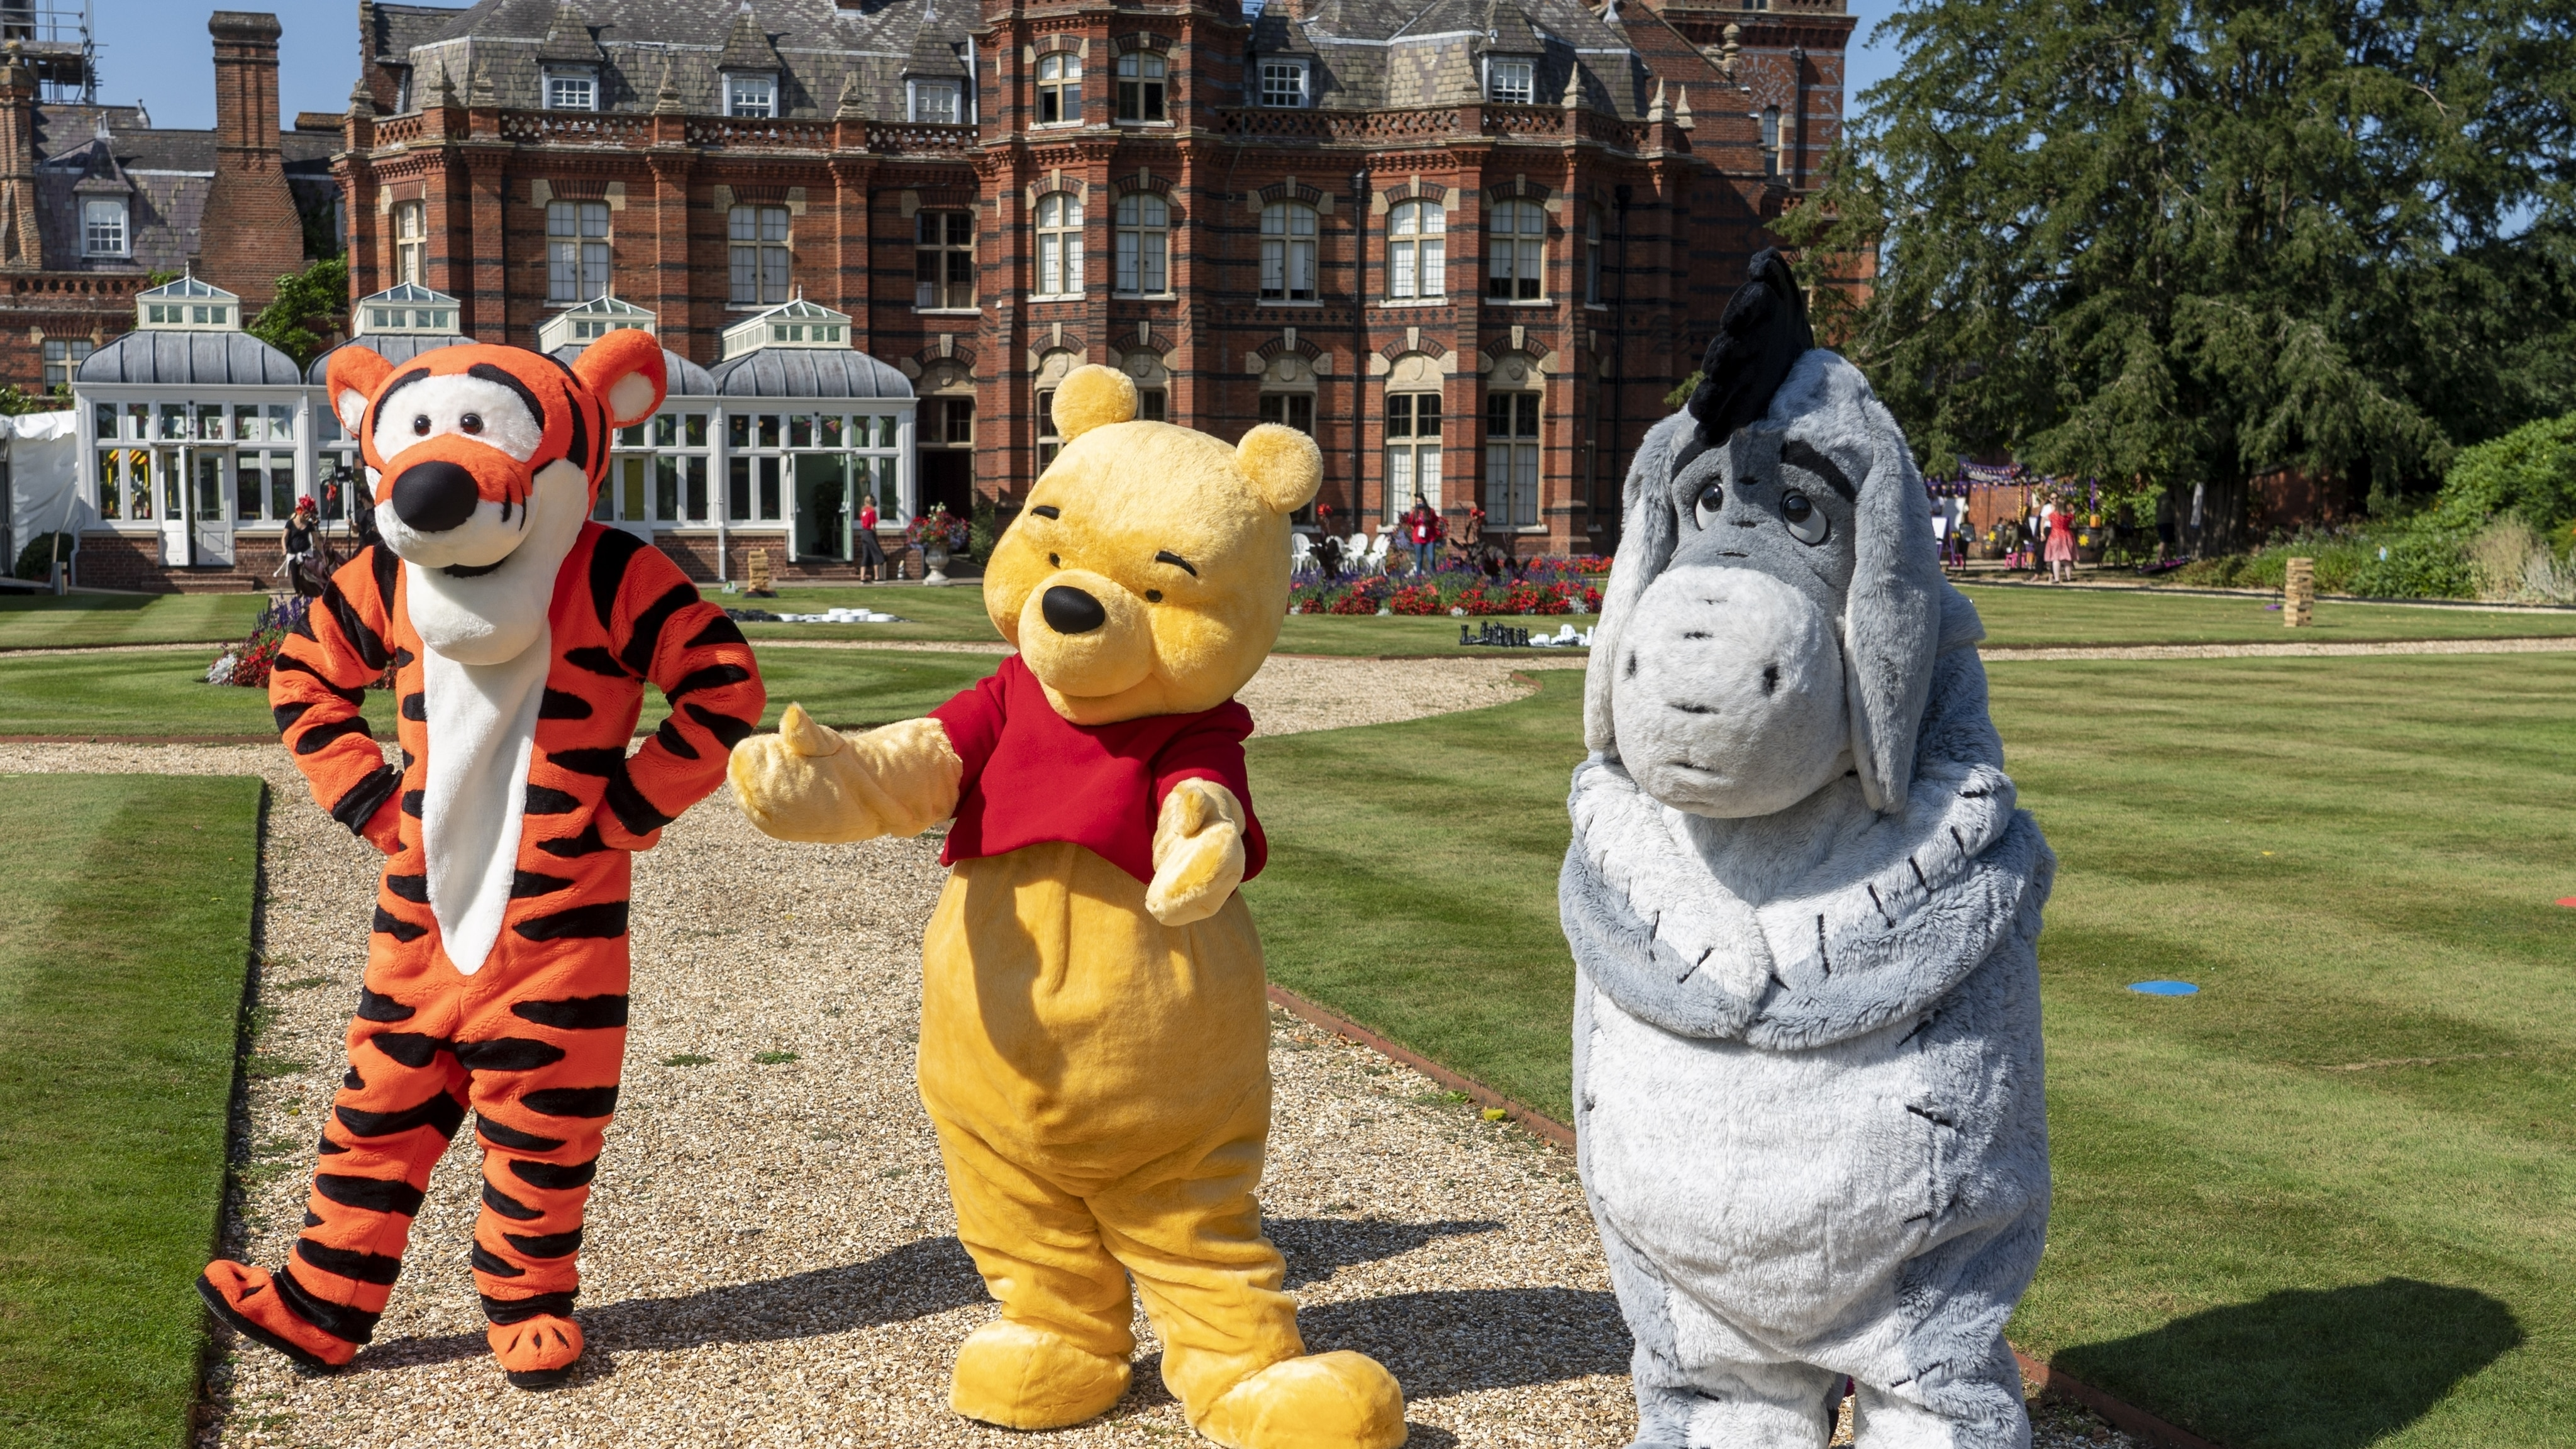 Tigger, Winnie the Pooh and Eeyore